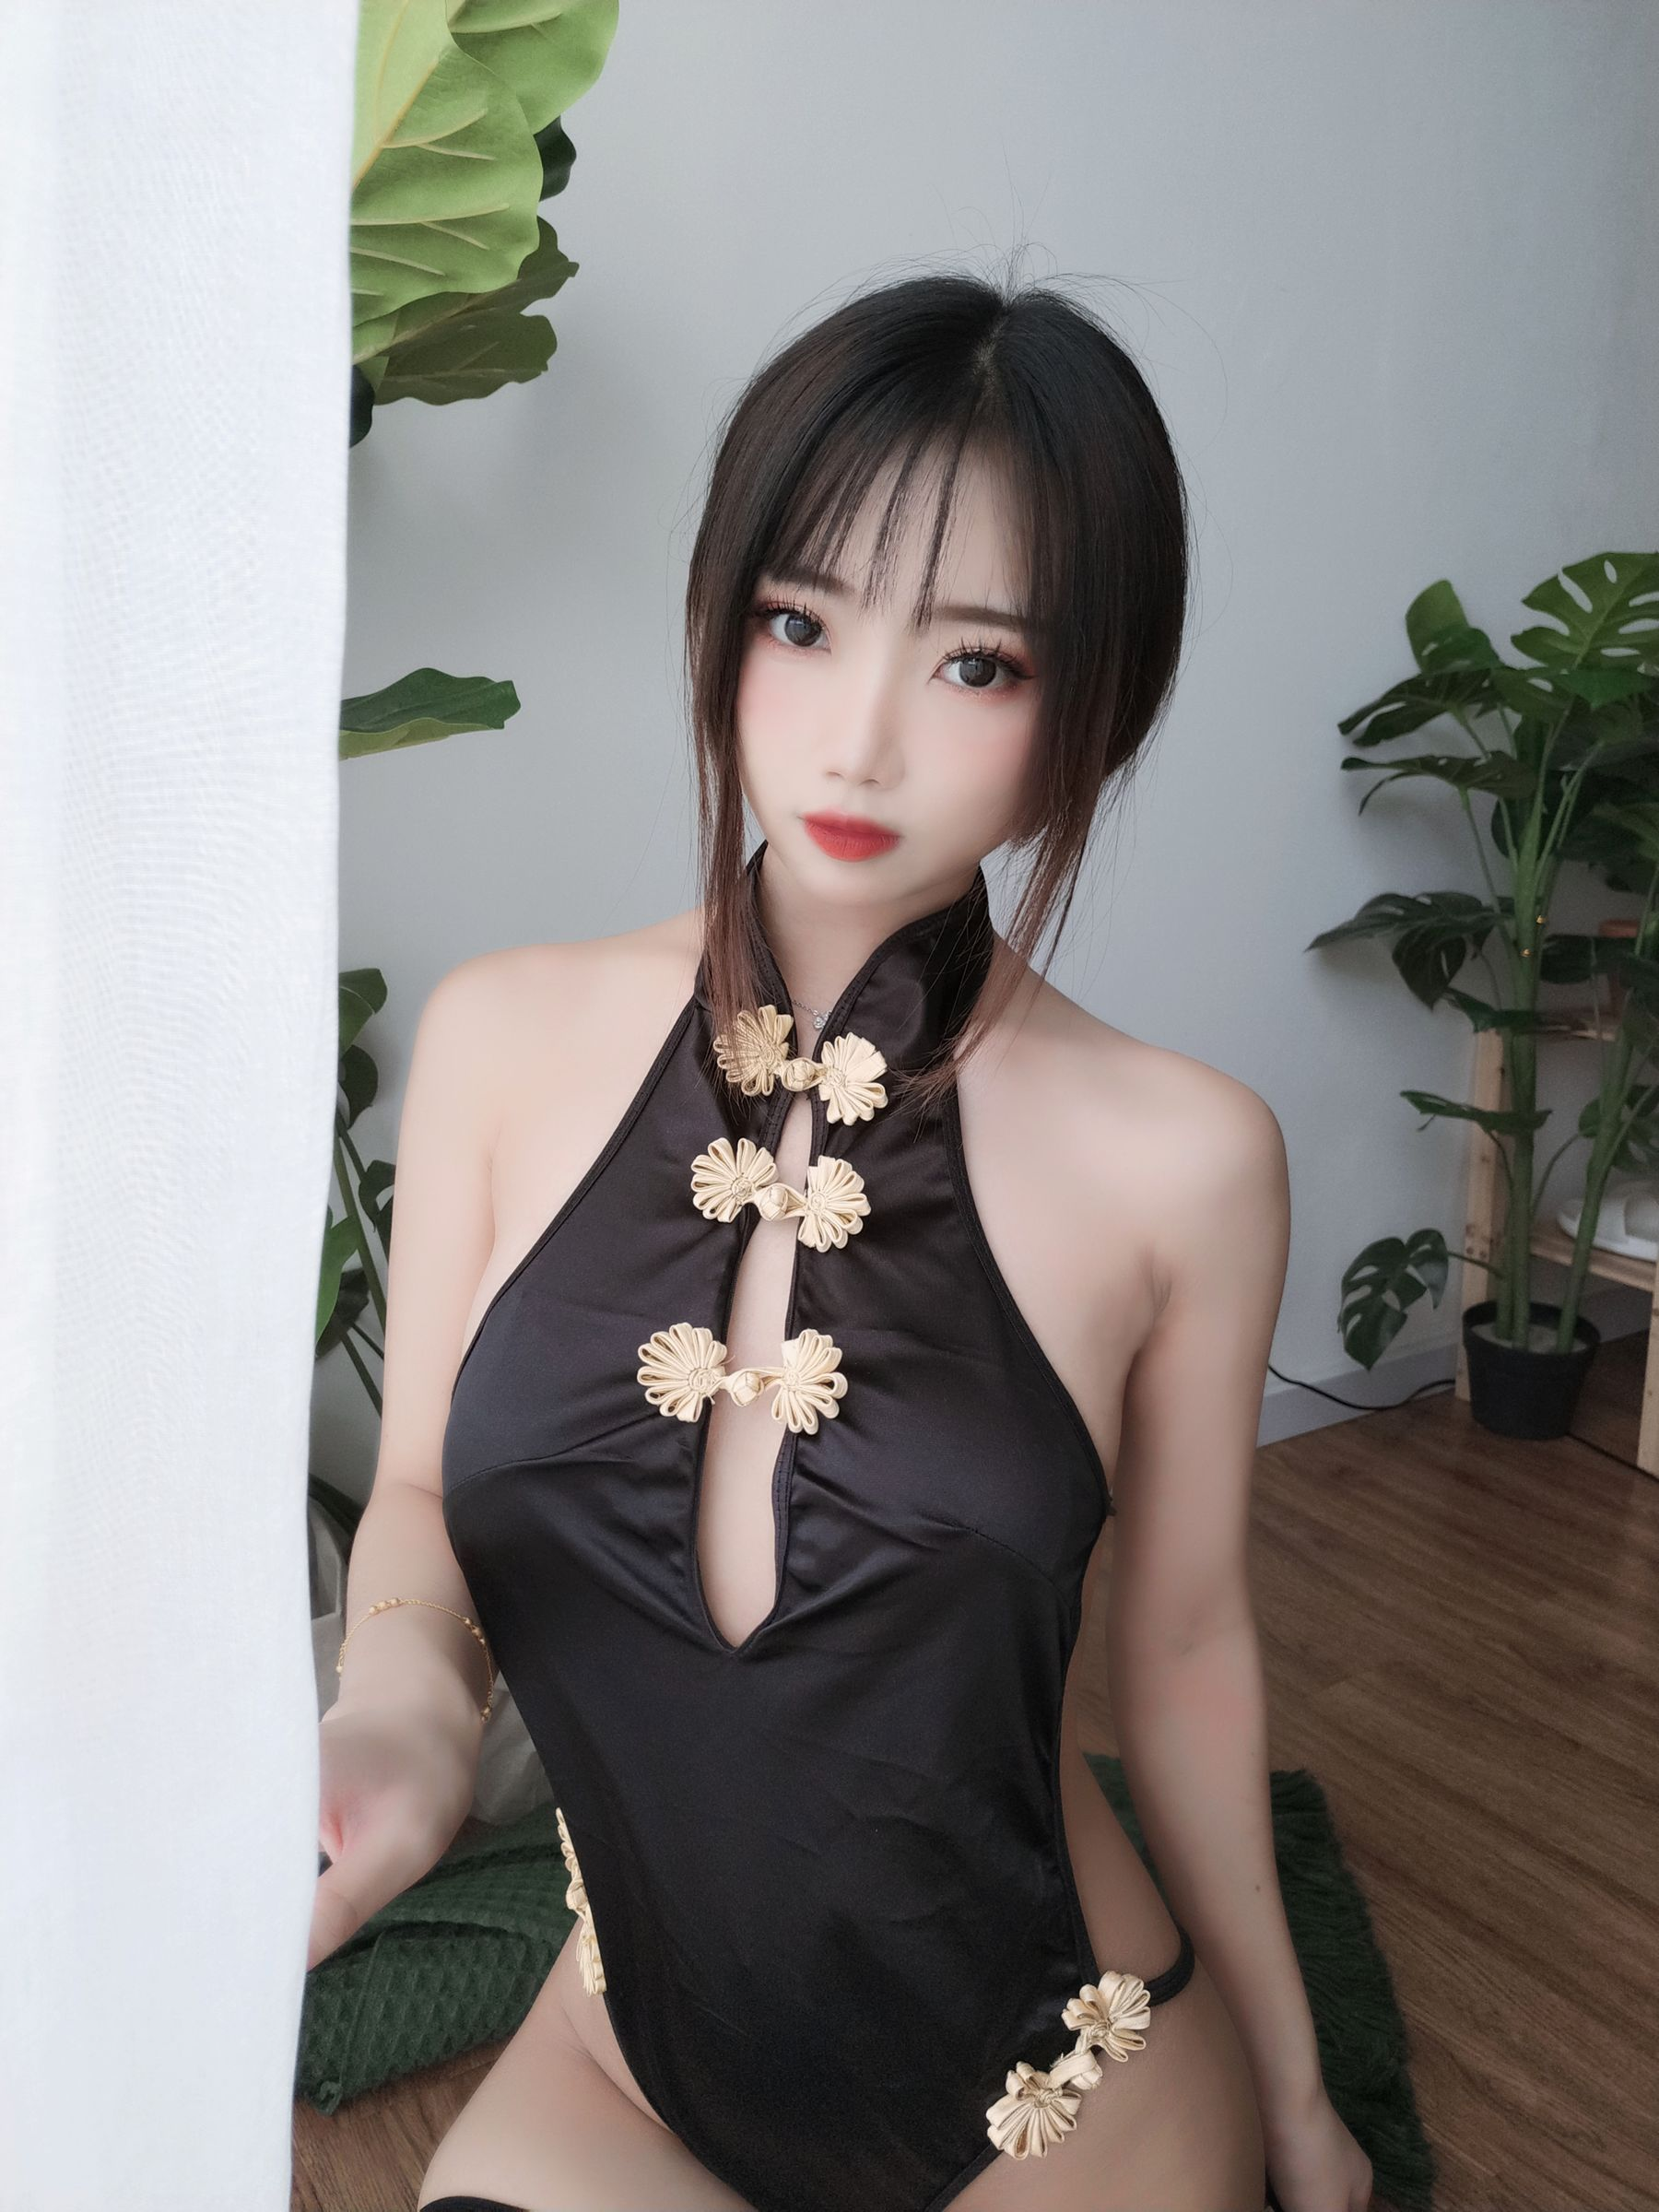 Cosplay] 白嫩美少女鬼畜瑤 - COSPLAY -